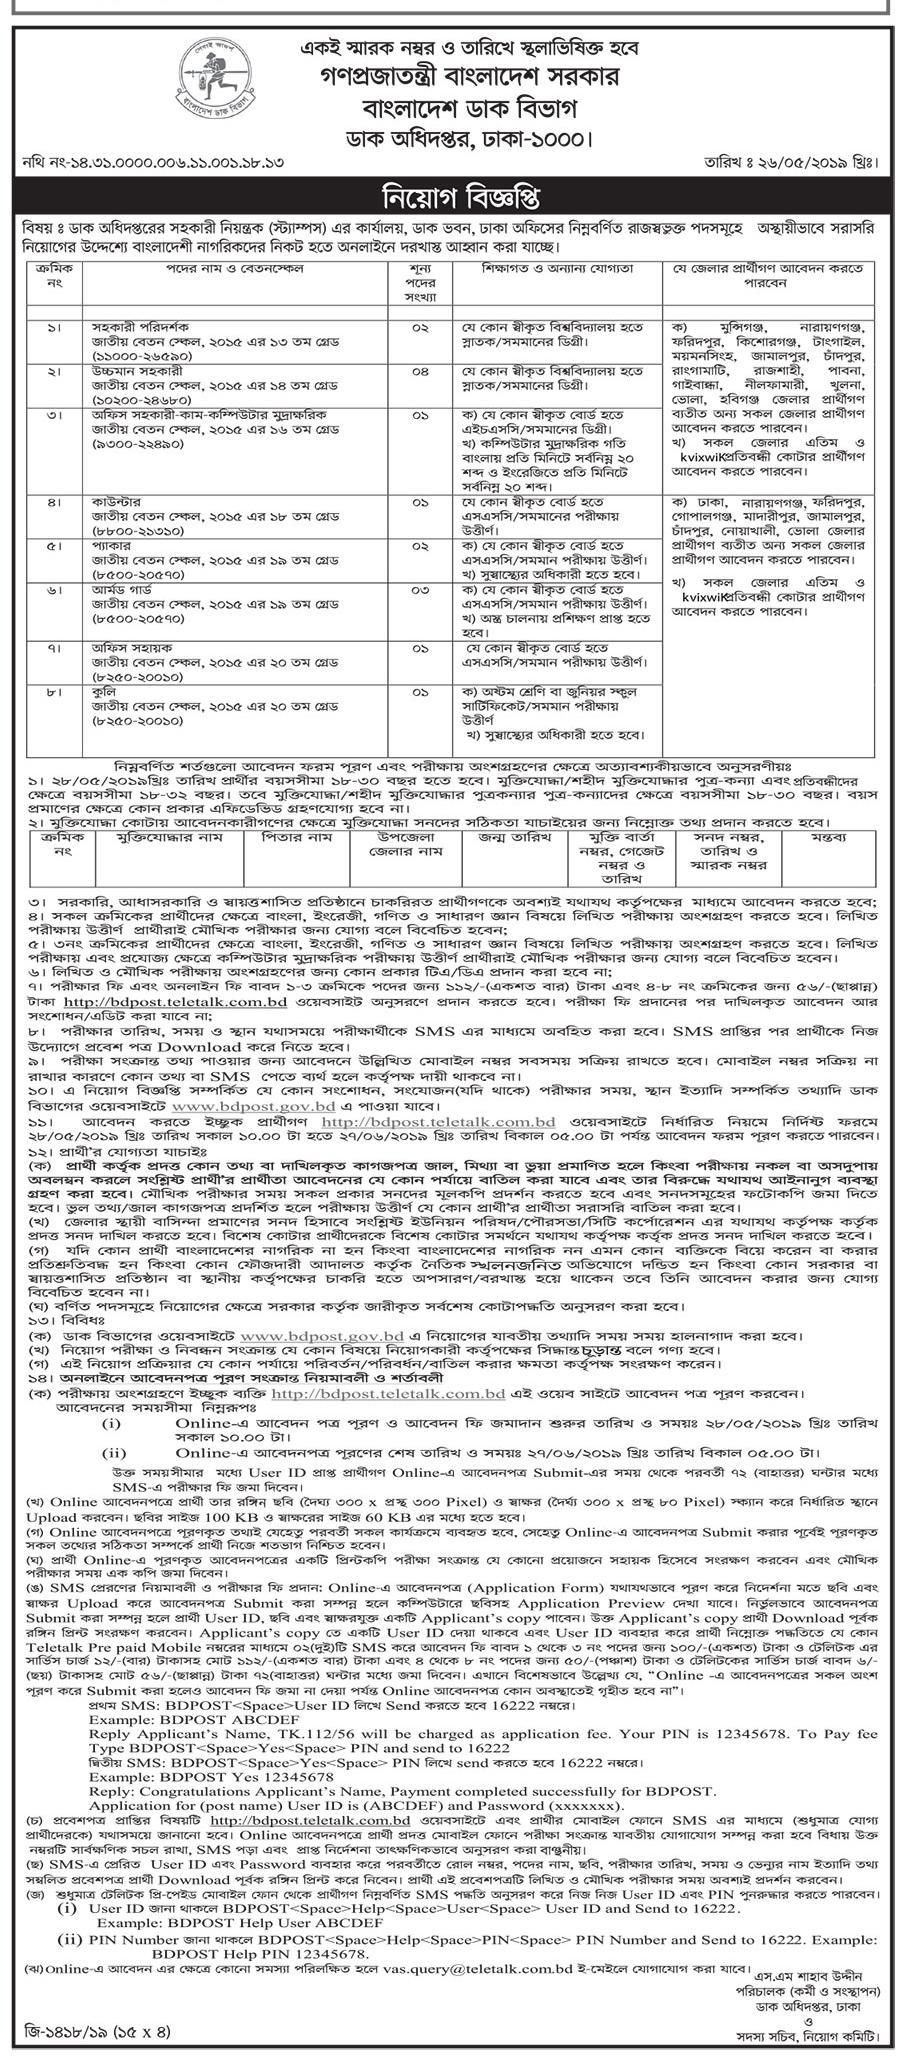 Bangladesh Post Office Job Circular 2019 Www Bangladeshpost Gov Bd Lekhapora Bd Jobs Job Circular Office Job Job